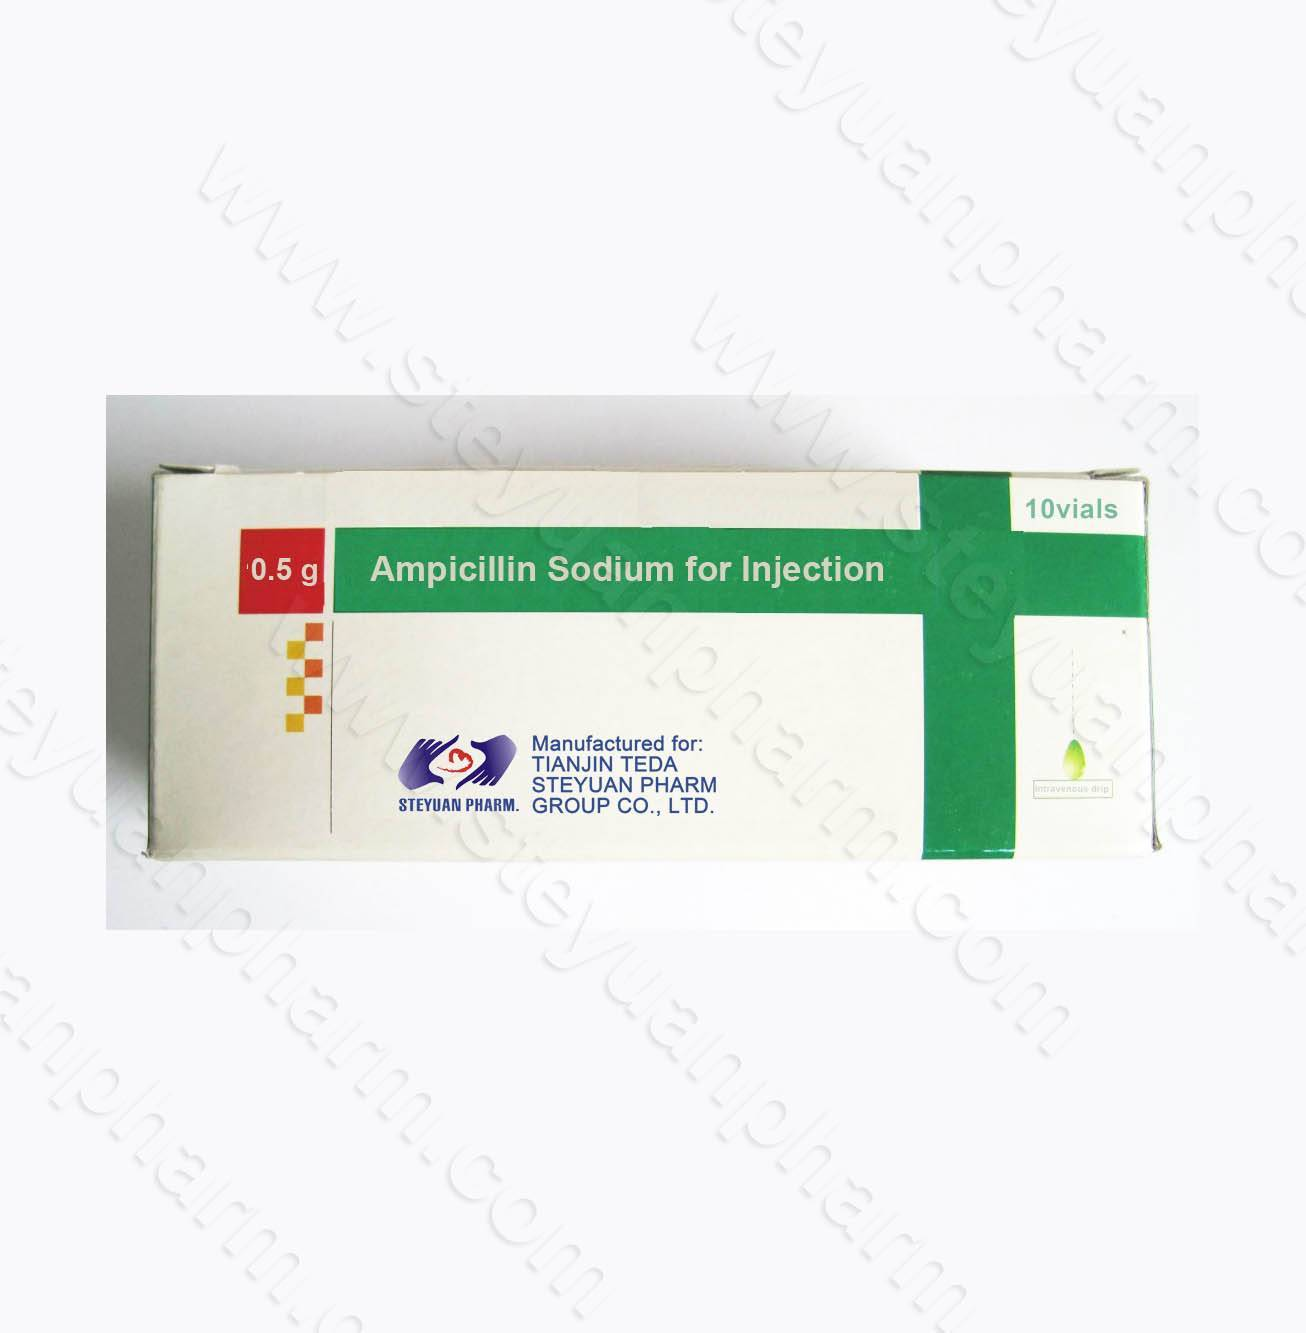 Ampicillin sodium for injection 500mg